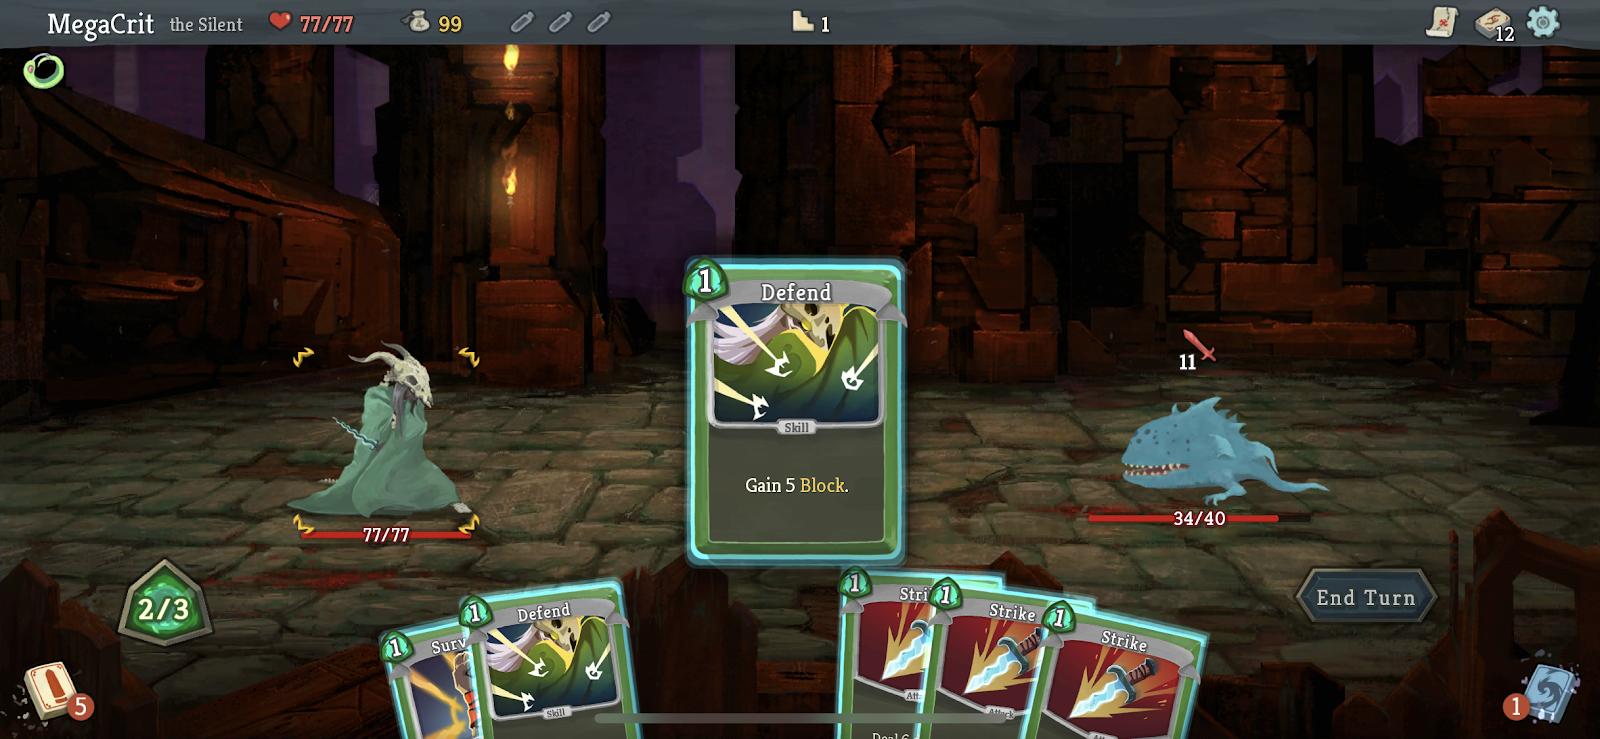 An iOS screenshot for Slay the Spire